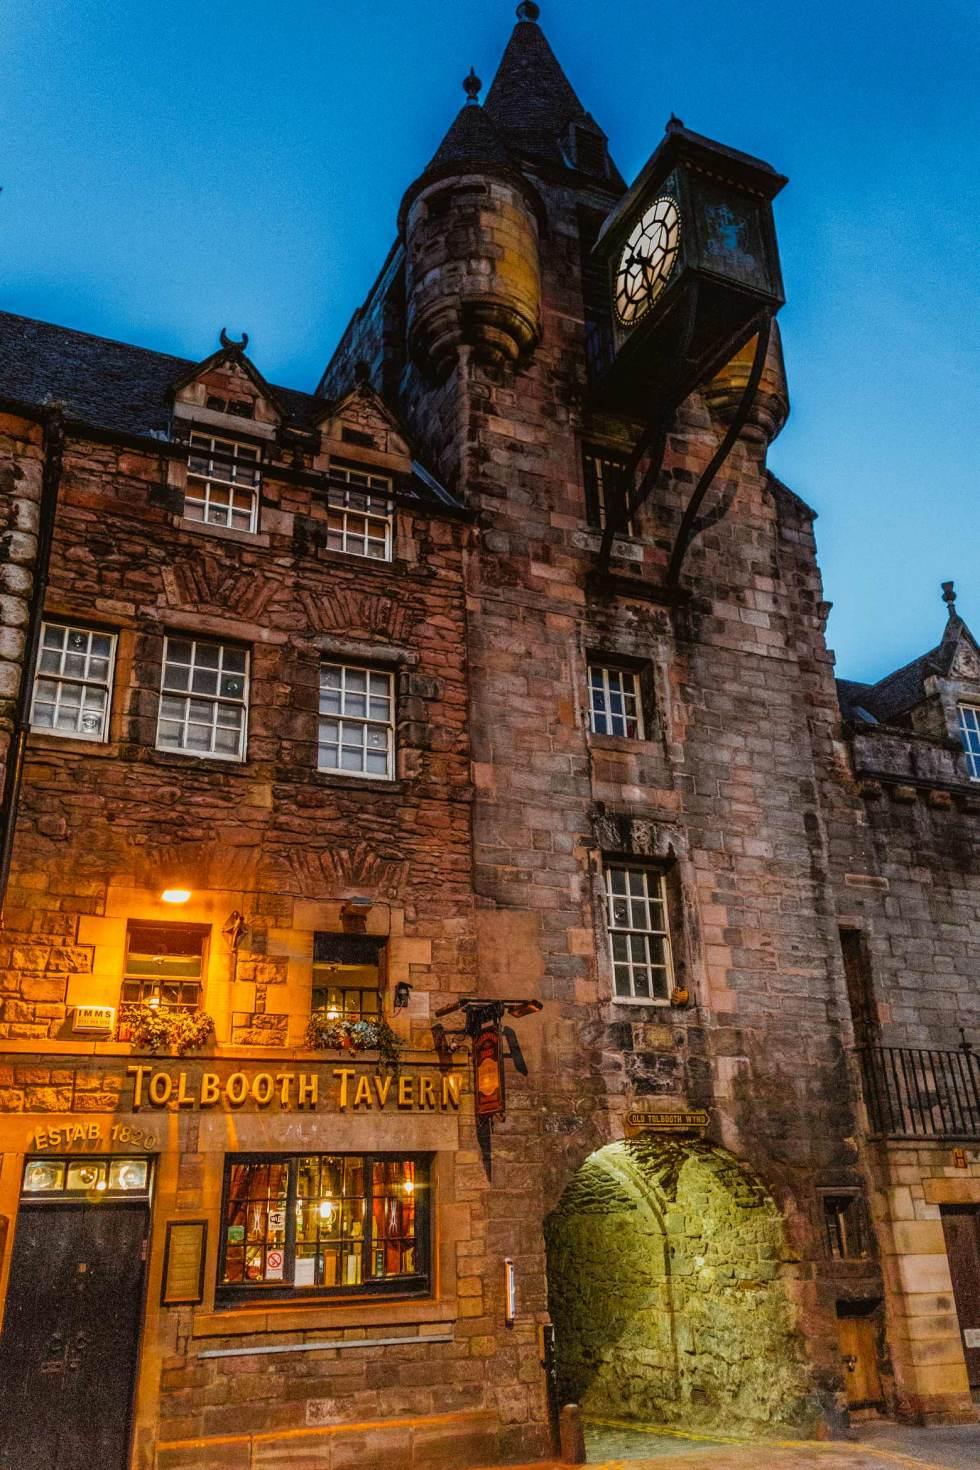 Edinburgh Canongate Tolbooth historical prison